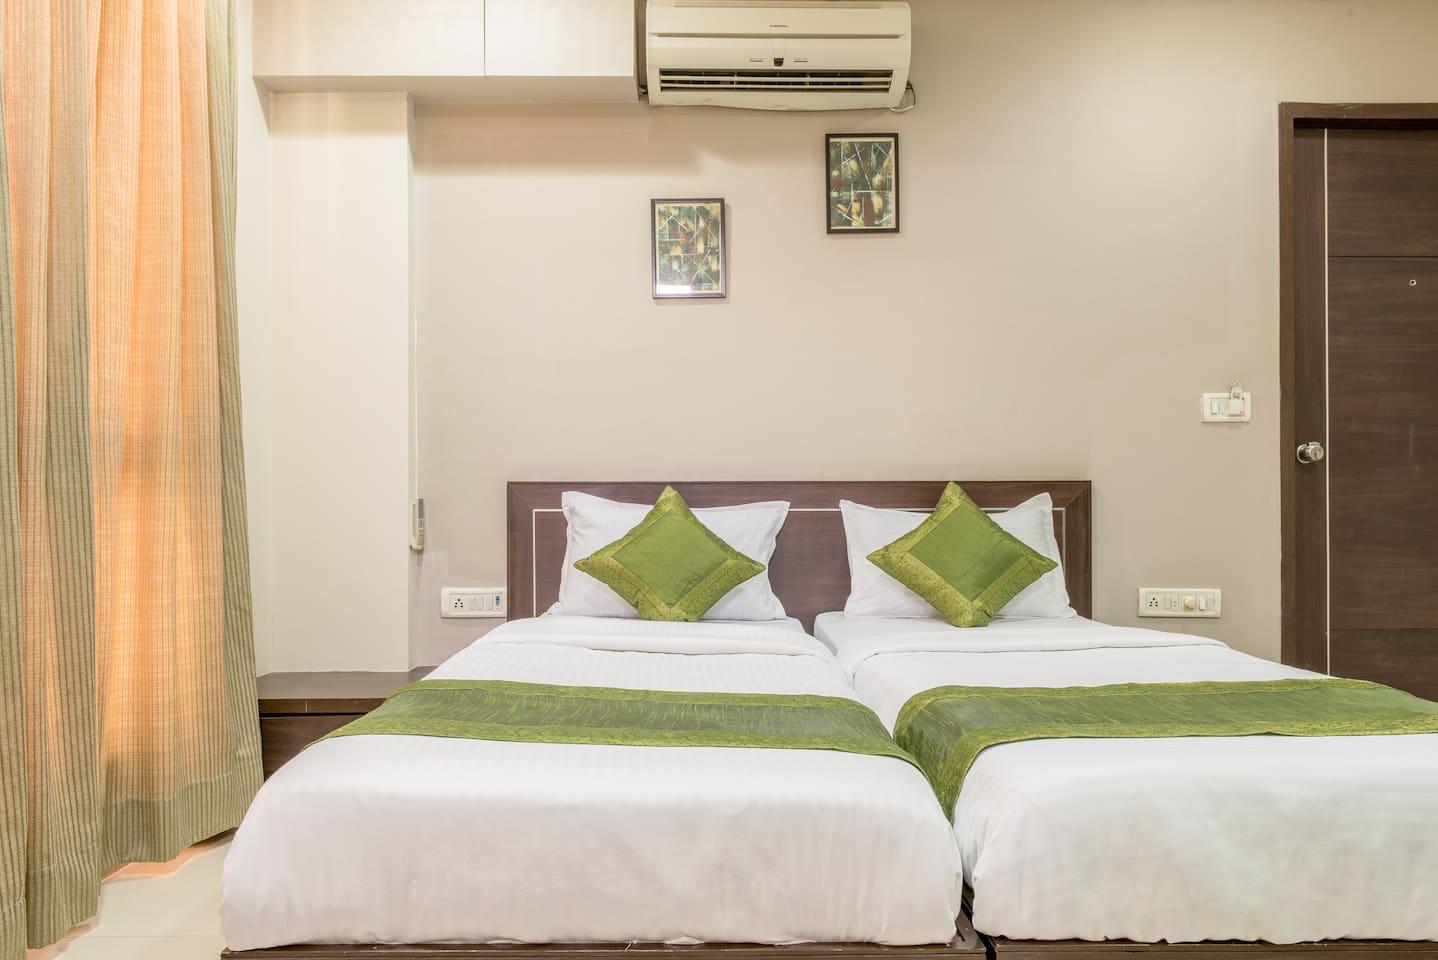 Studio Apartment Ahmedabad Tcs boutique stay @ ramdevnagar, ahmedabad - boutique hotels for rent